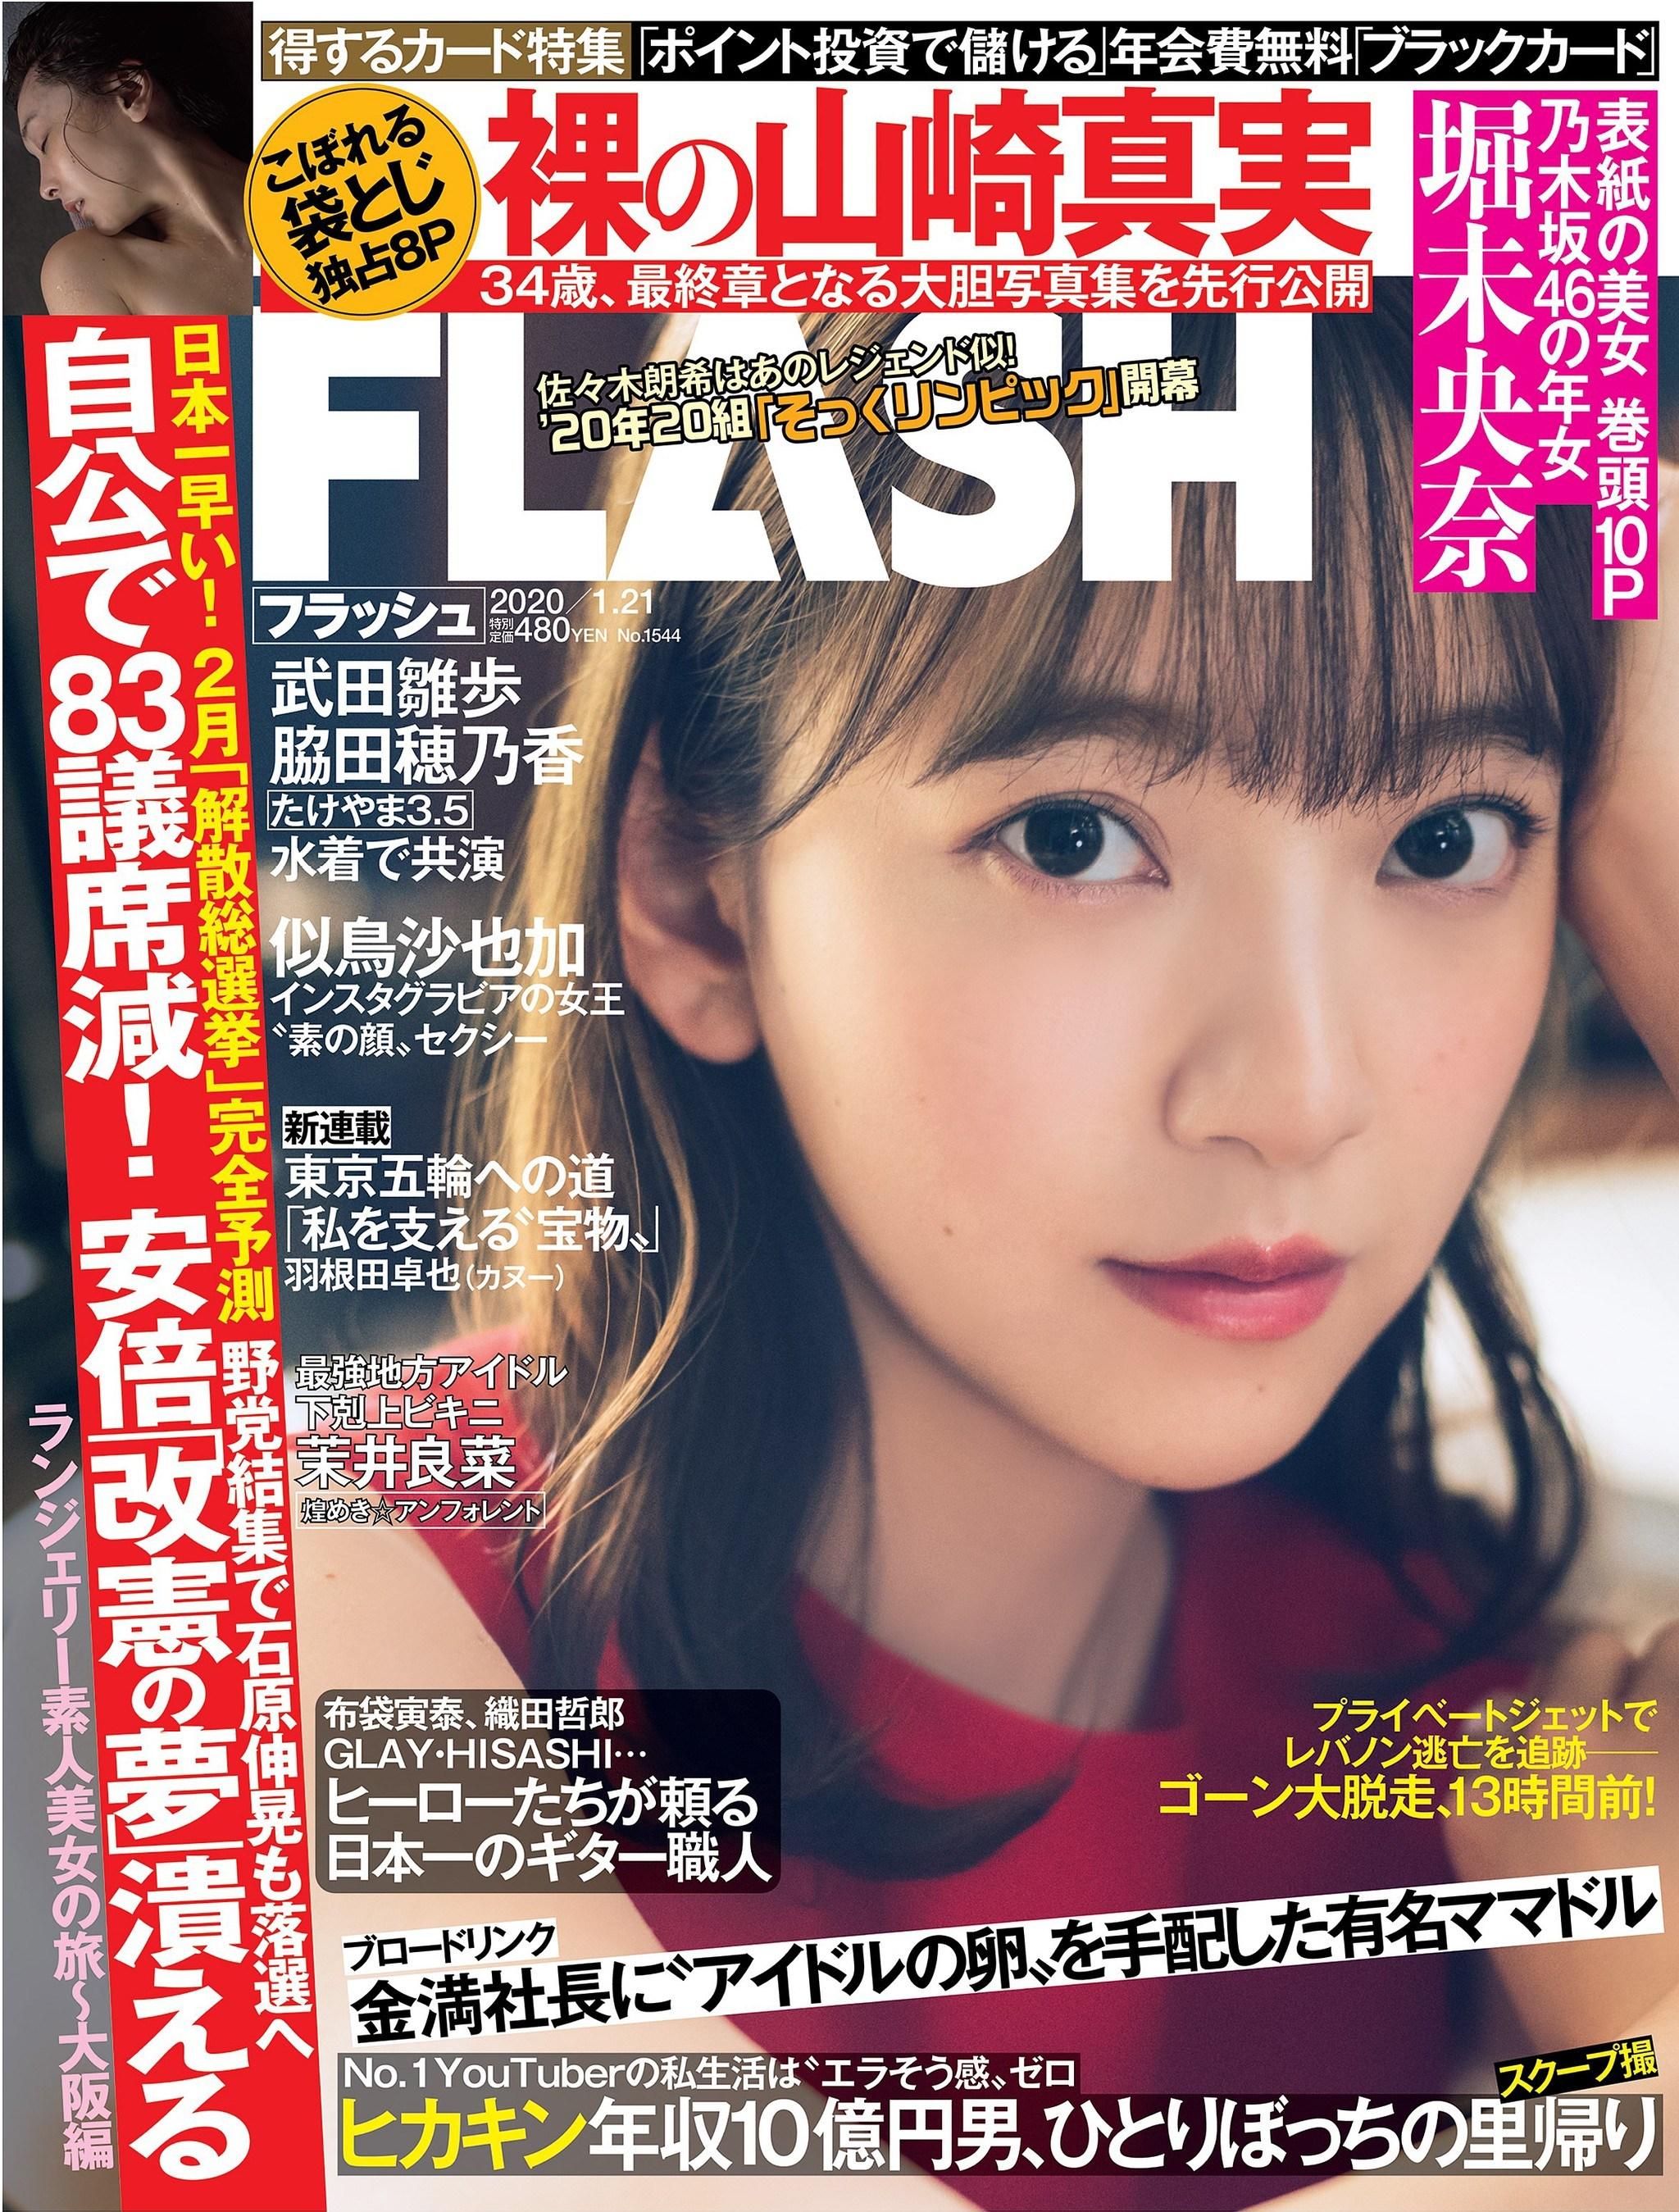 FLASH 2020年01月21号 乃木坂46 堀未央奈